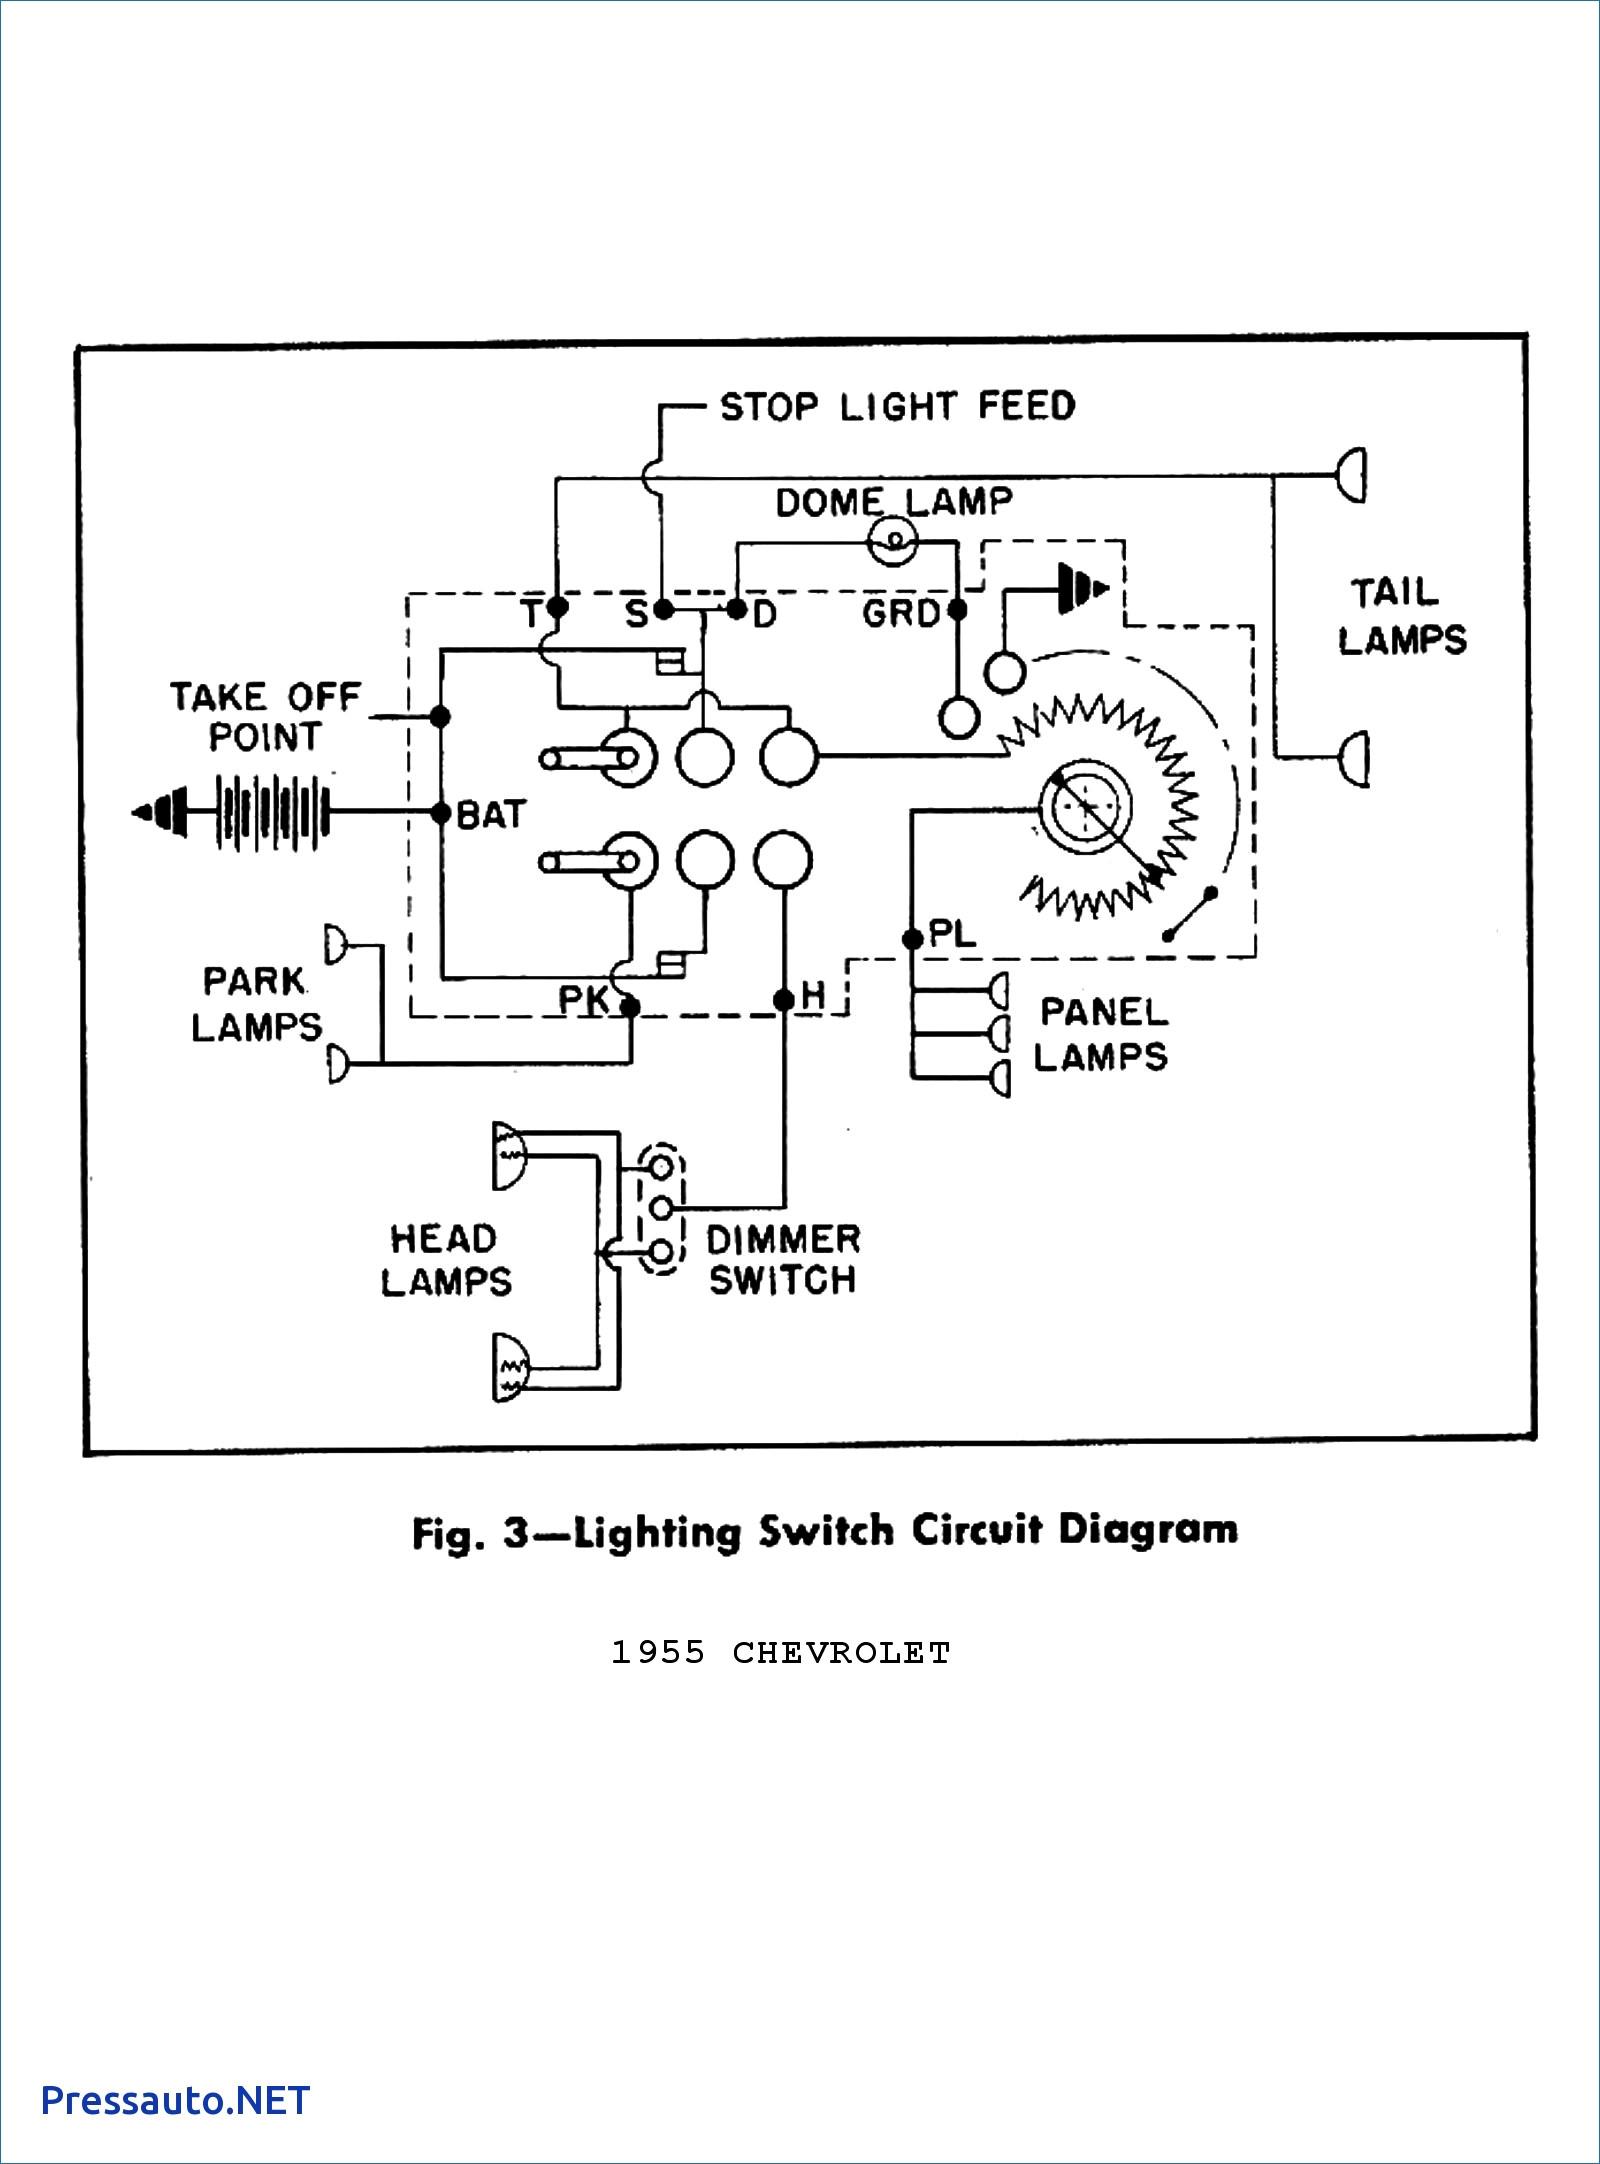 hight resolution of jl audio 500 1v2 wiring diagram jl audio 500 1v2 wiring diagram 2001 chevy tahoe